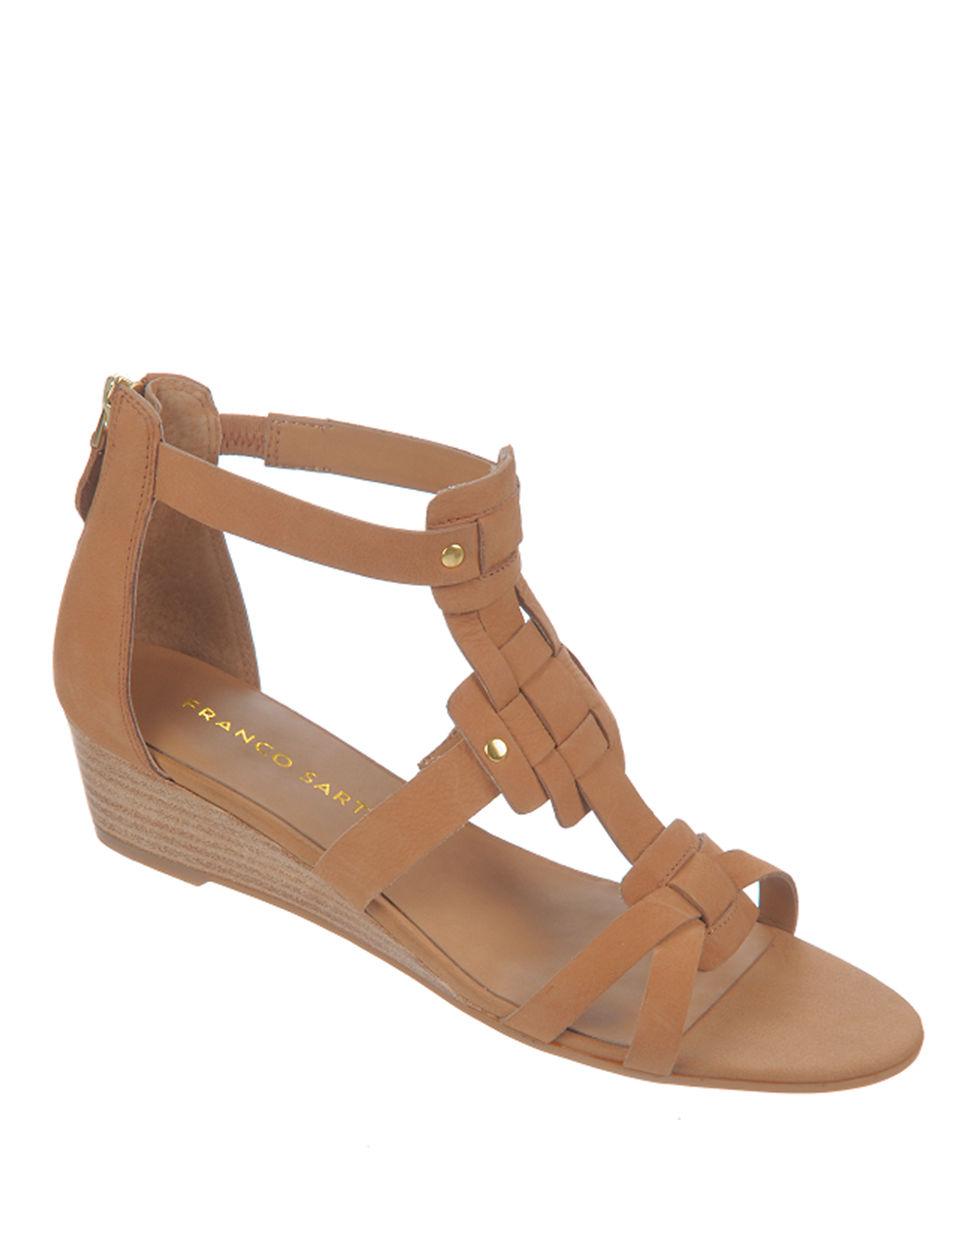 franco sarto ulysses nubuck leather wedge sandals in brown